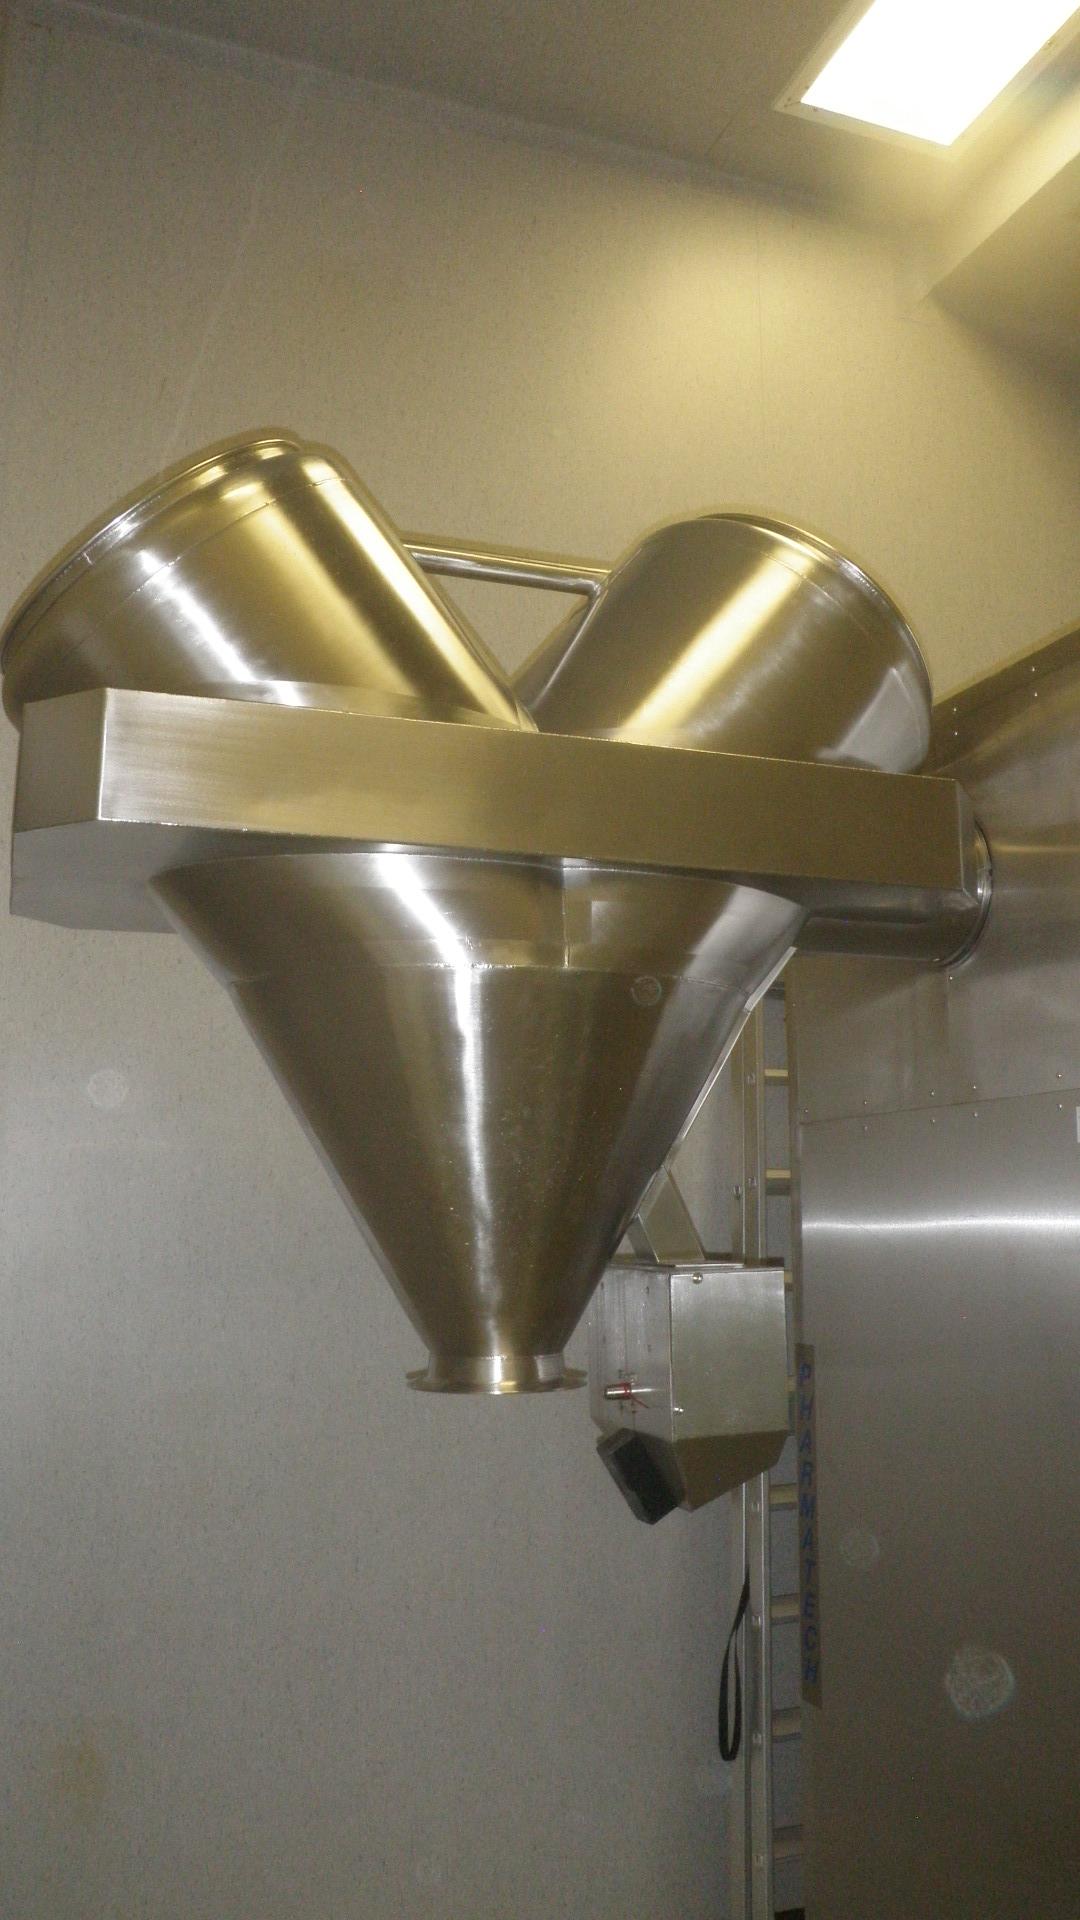 Pharmatech Mezcladores para Liquidos y Cremas /Turboemulsionador Pharmatech V 550 Lt.